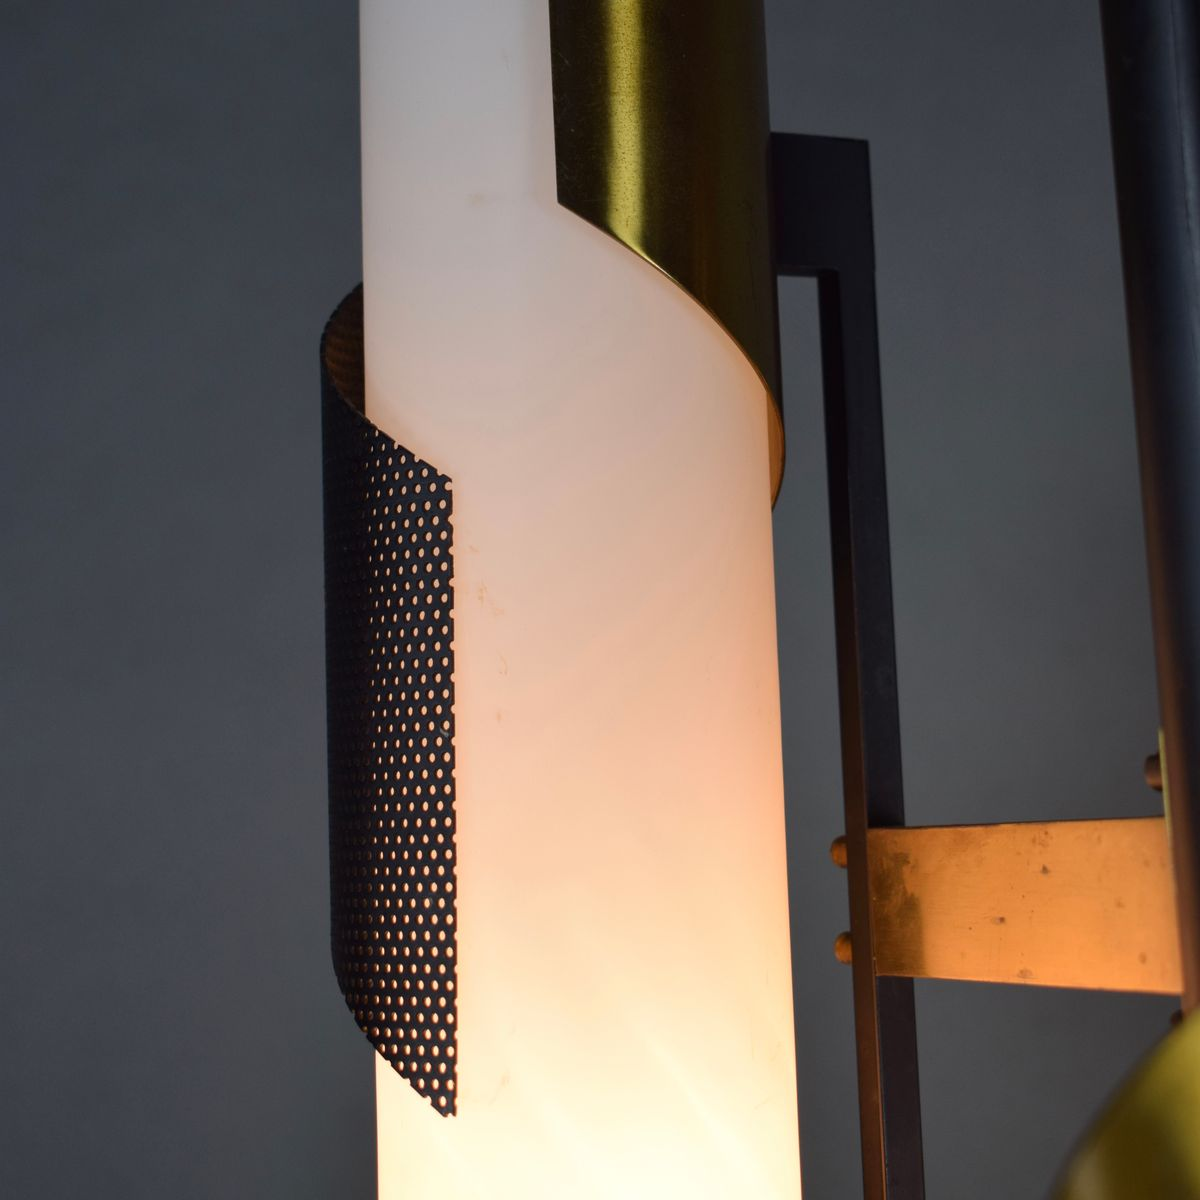 Mid century italian floor lamp from arredoluce for sale at for Arredo luce